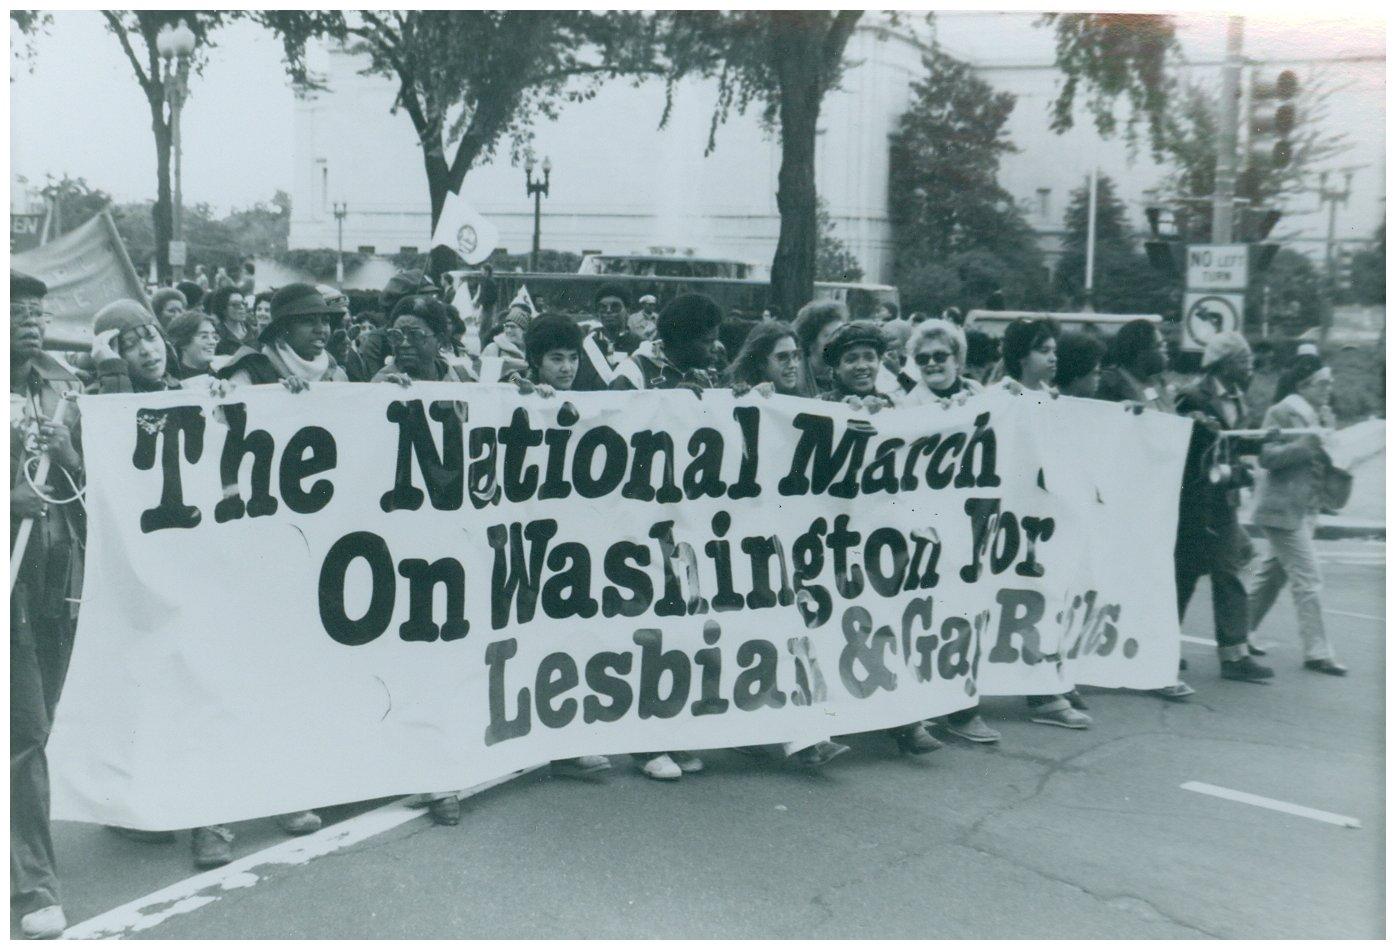 marcia nazionale per i diritti di gay e lesbiche